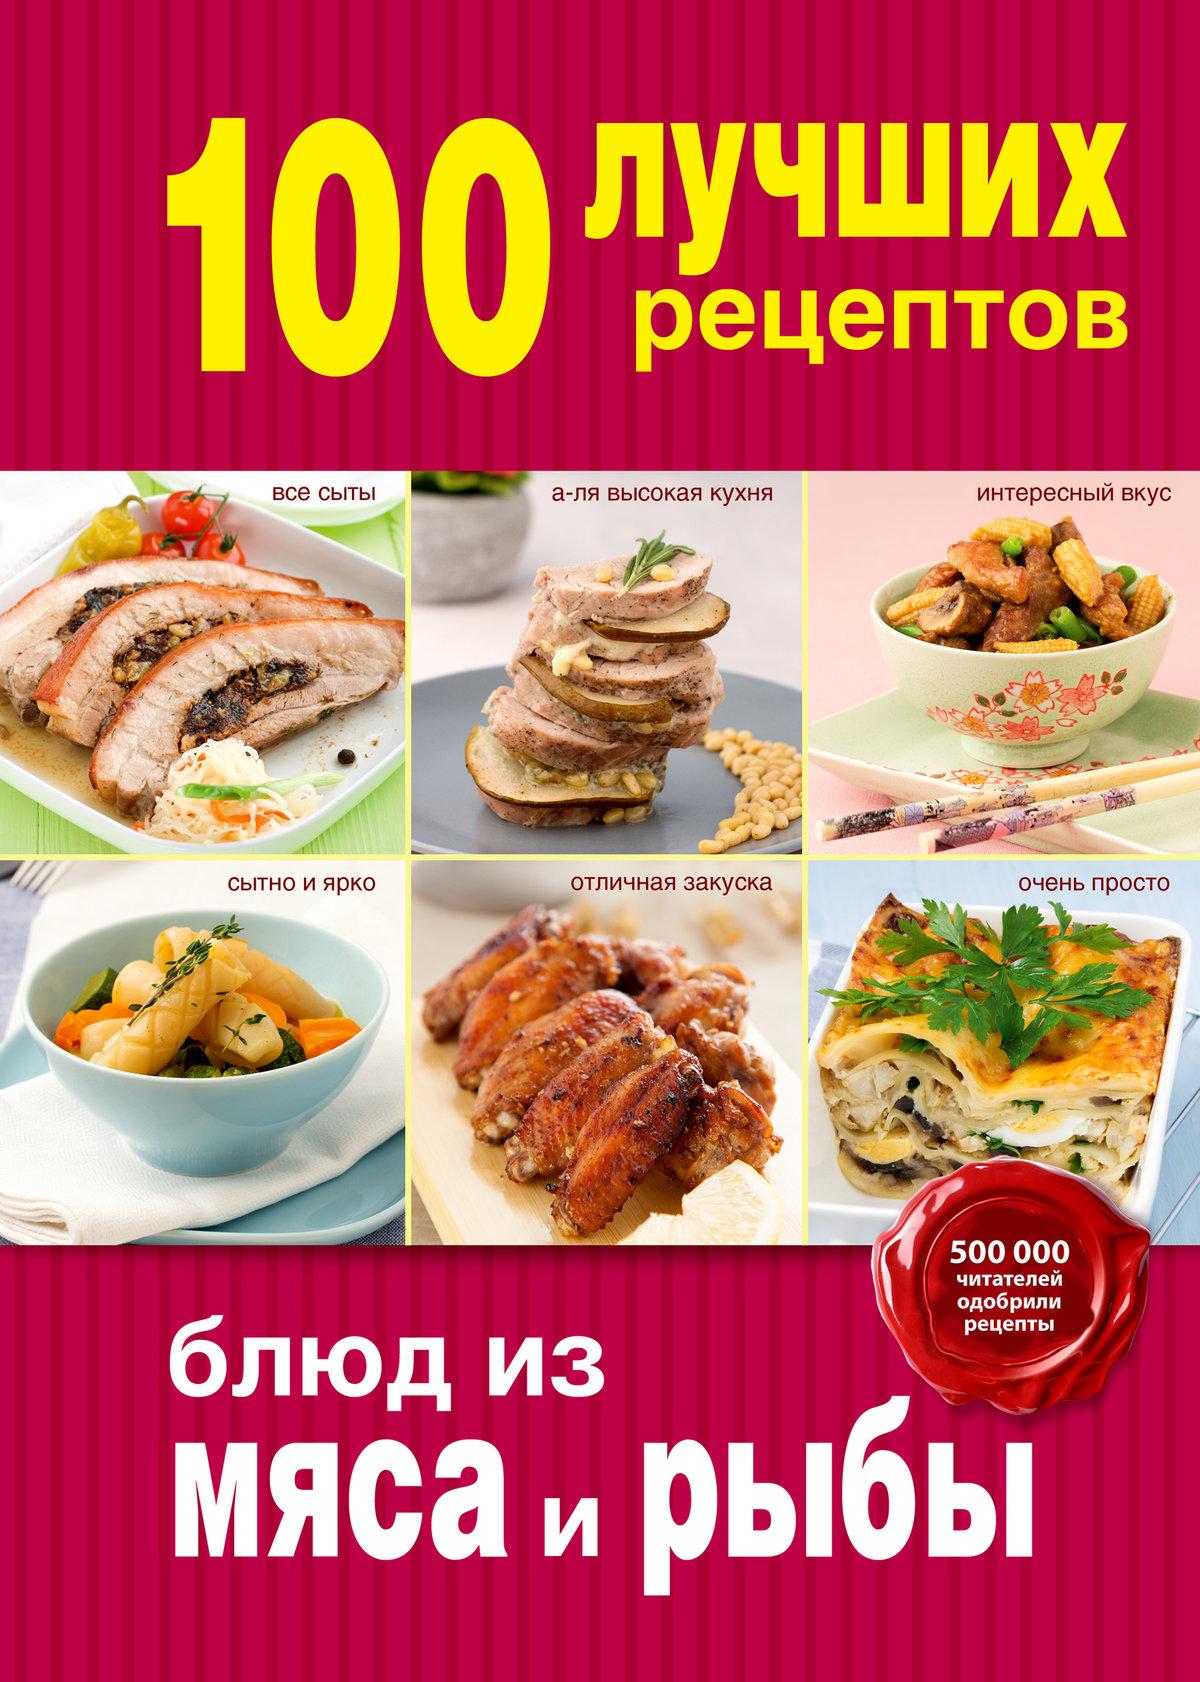 Картинки с рецептами блюд из мяса